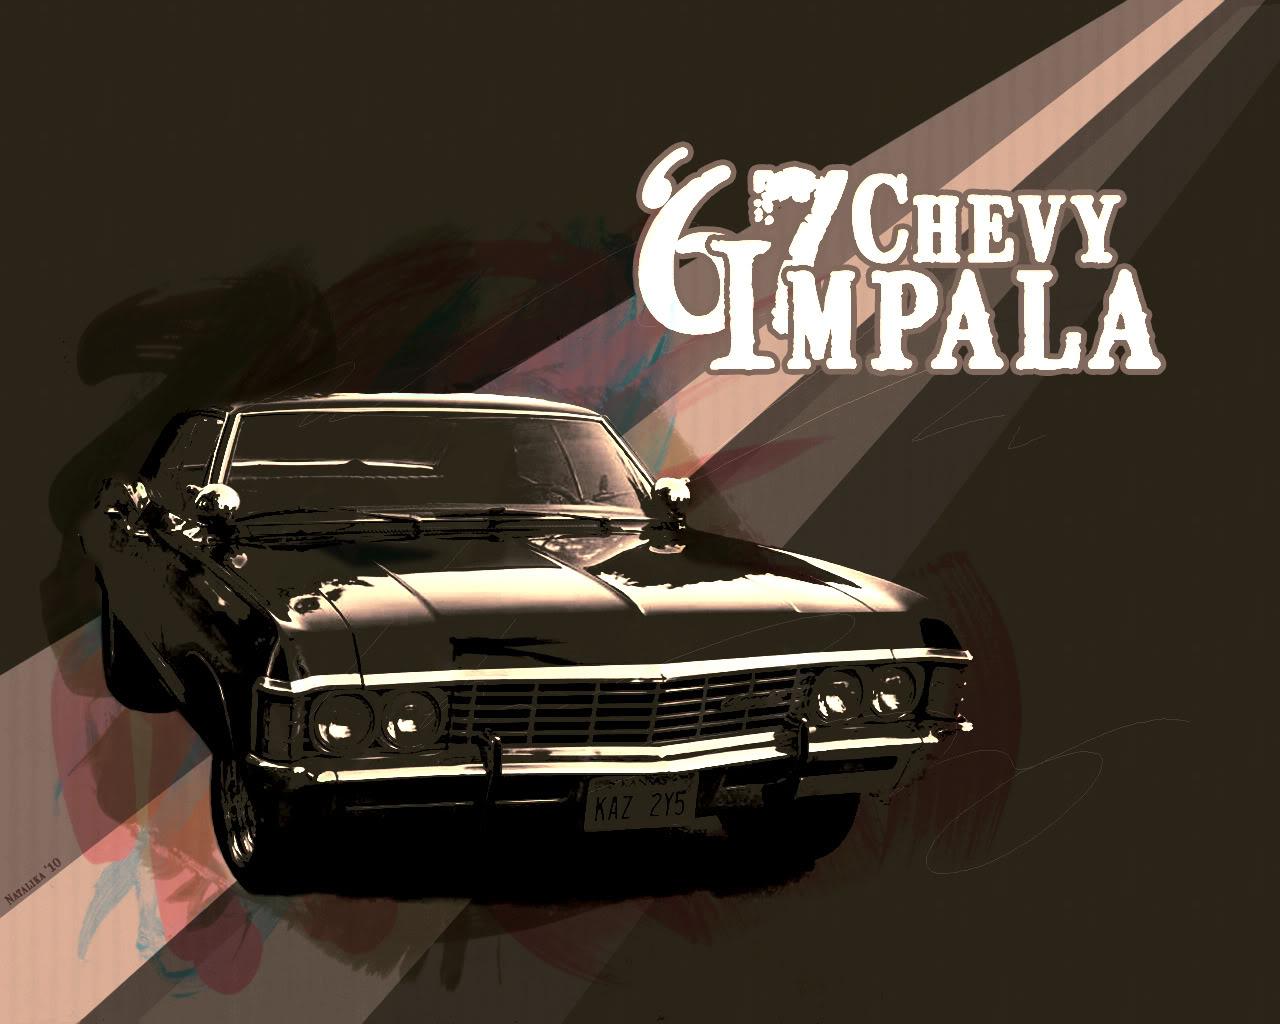 Supernatural Impala 2355718 Hd Wallpaper Backgrounds Download